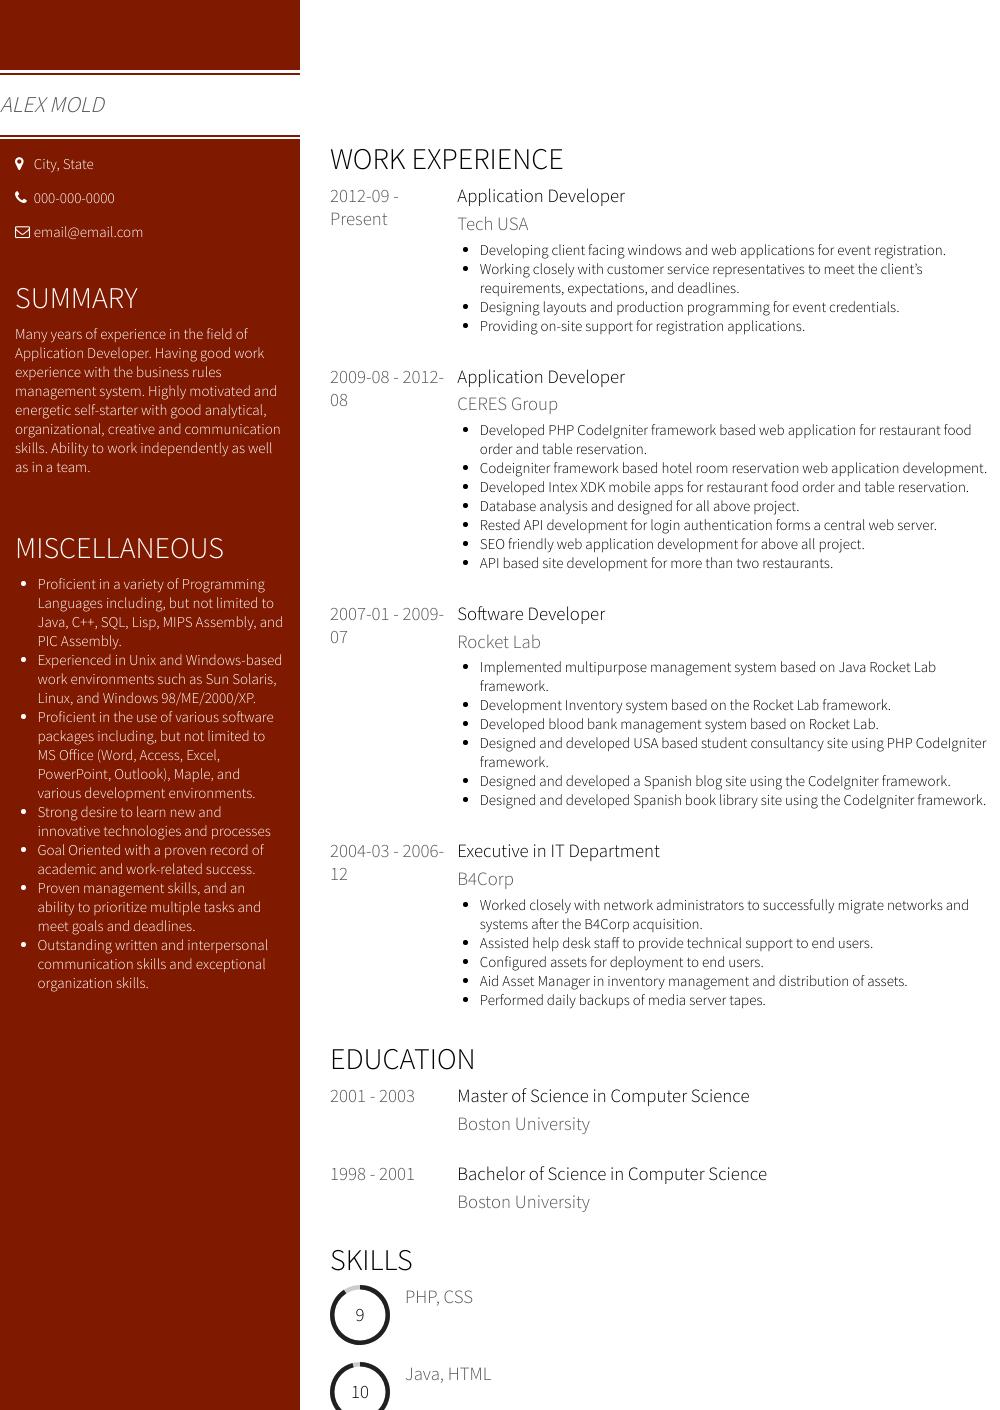 Application Developer Resume Sample and Template